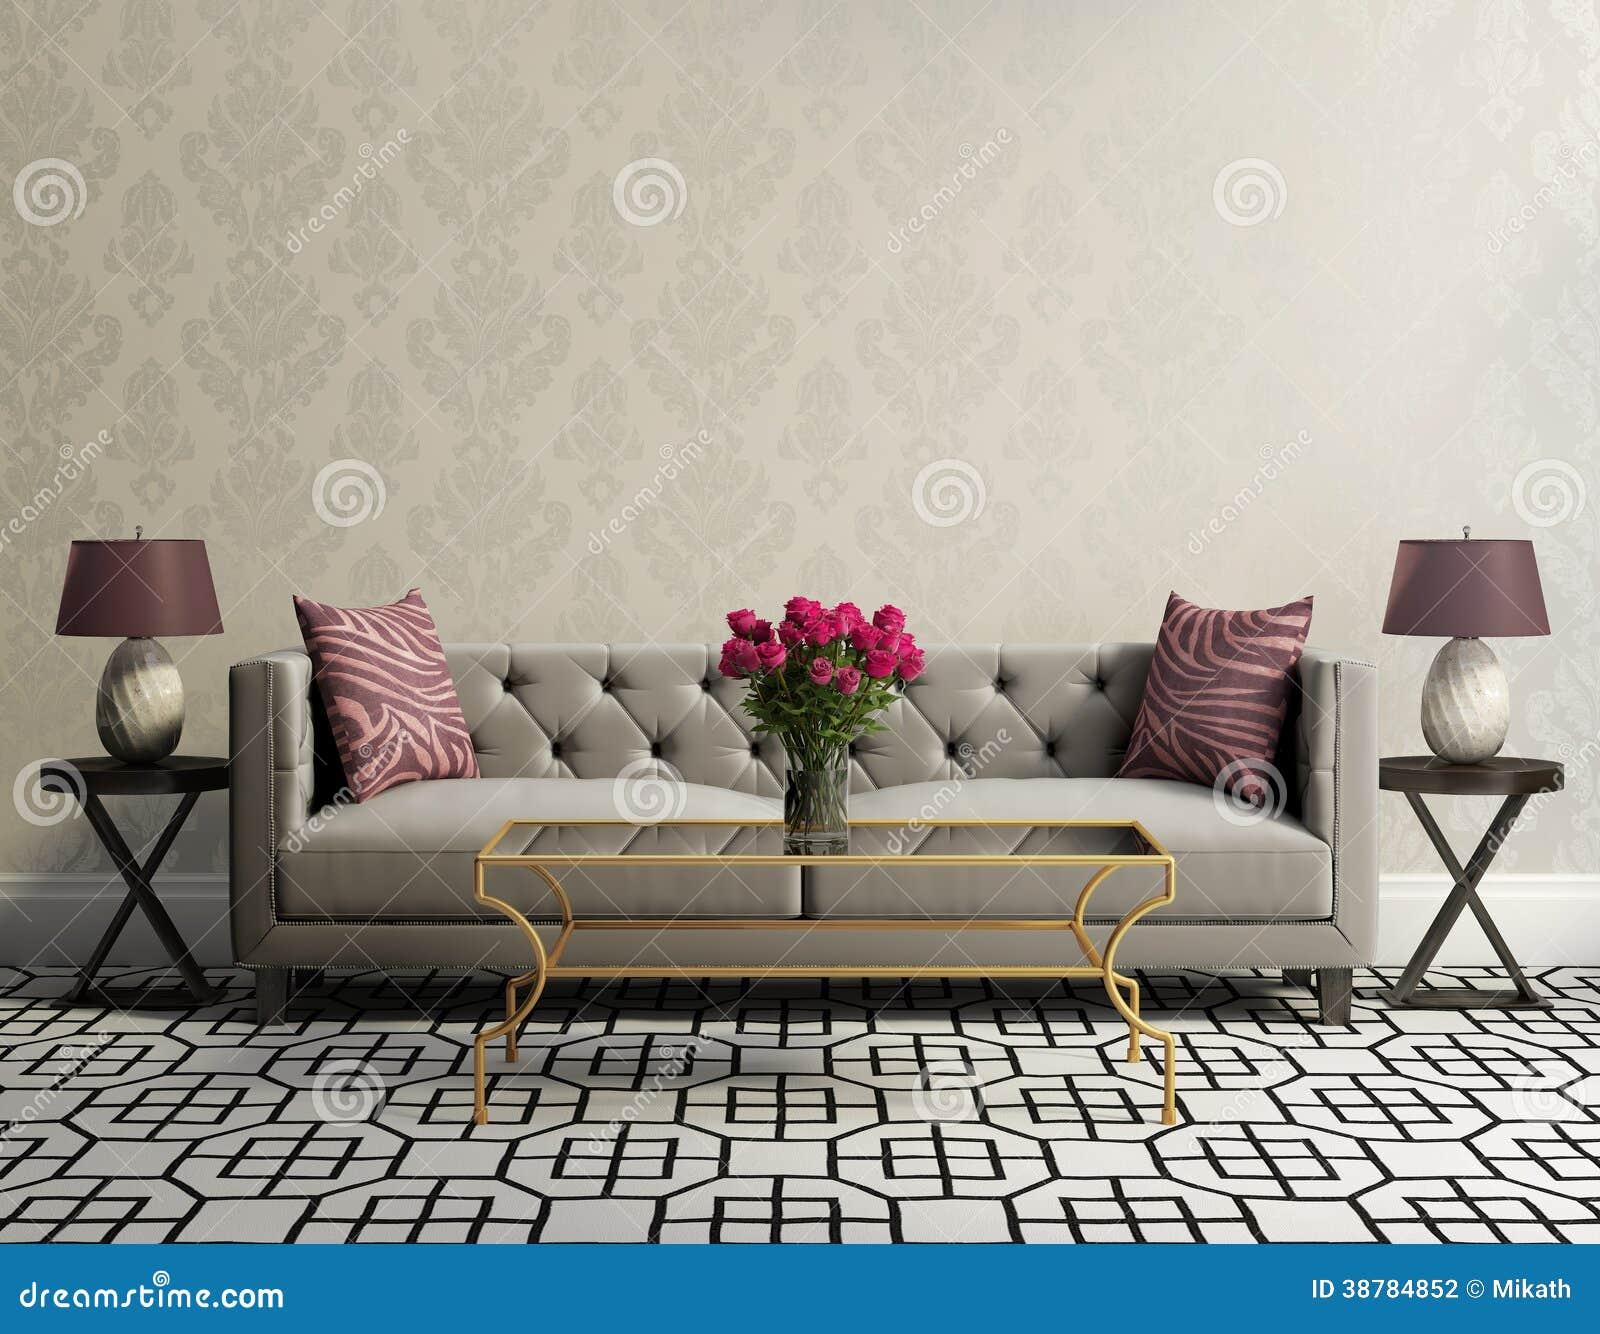 Luxury Crushed Velvet Sofa